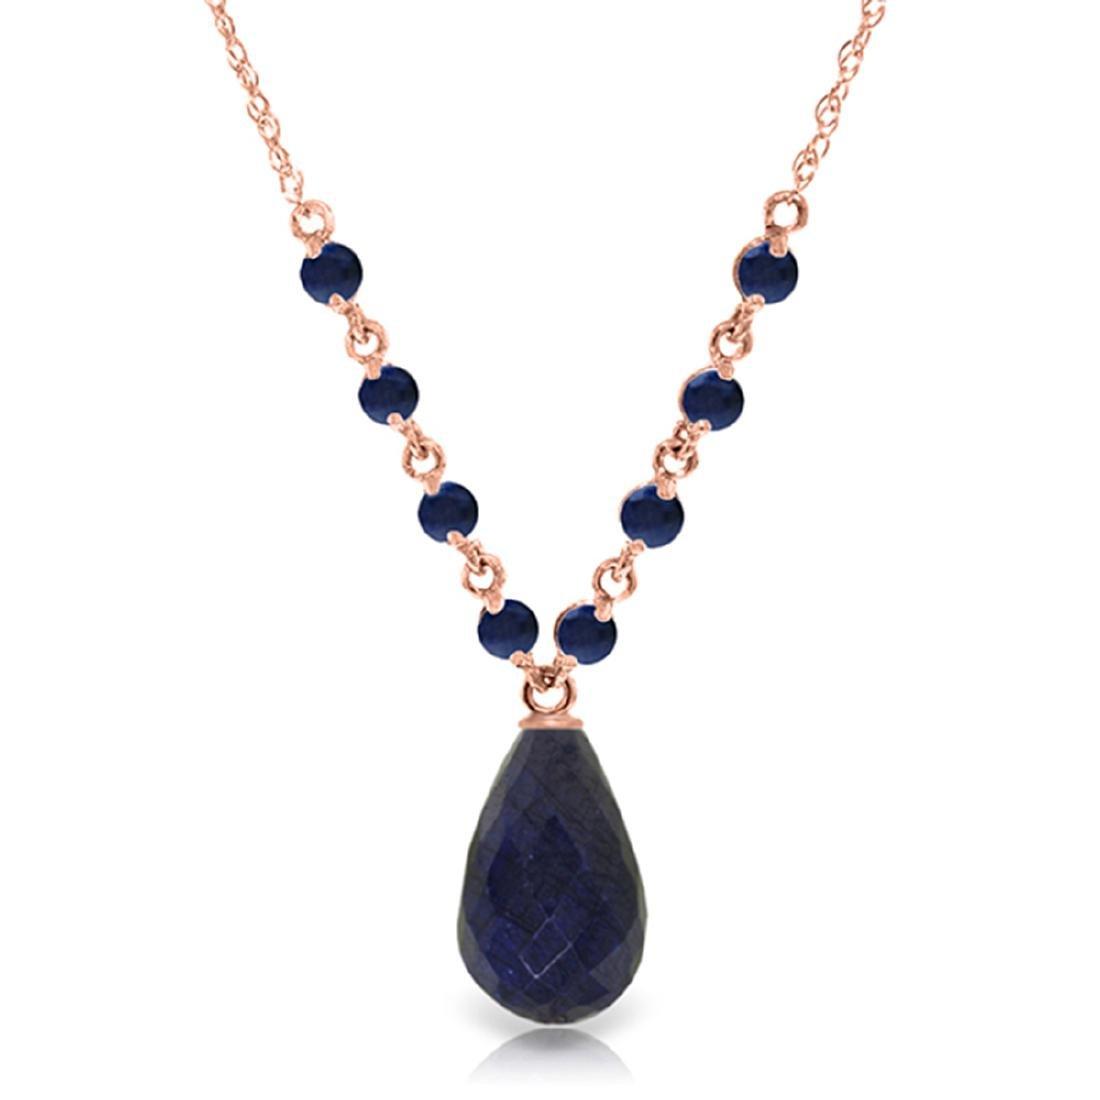 Genuine 15.8 ctw Sapphire Necklace Jewelry 14KT Rose